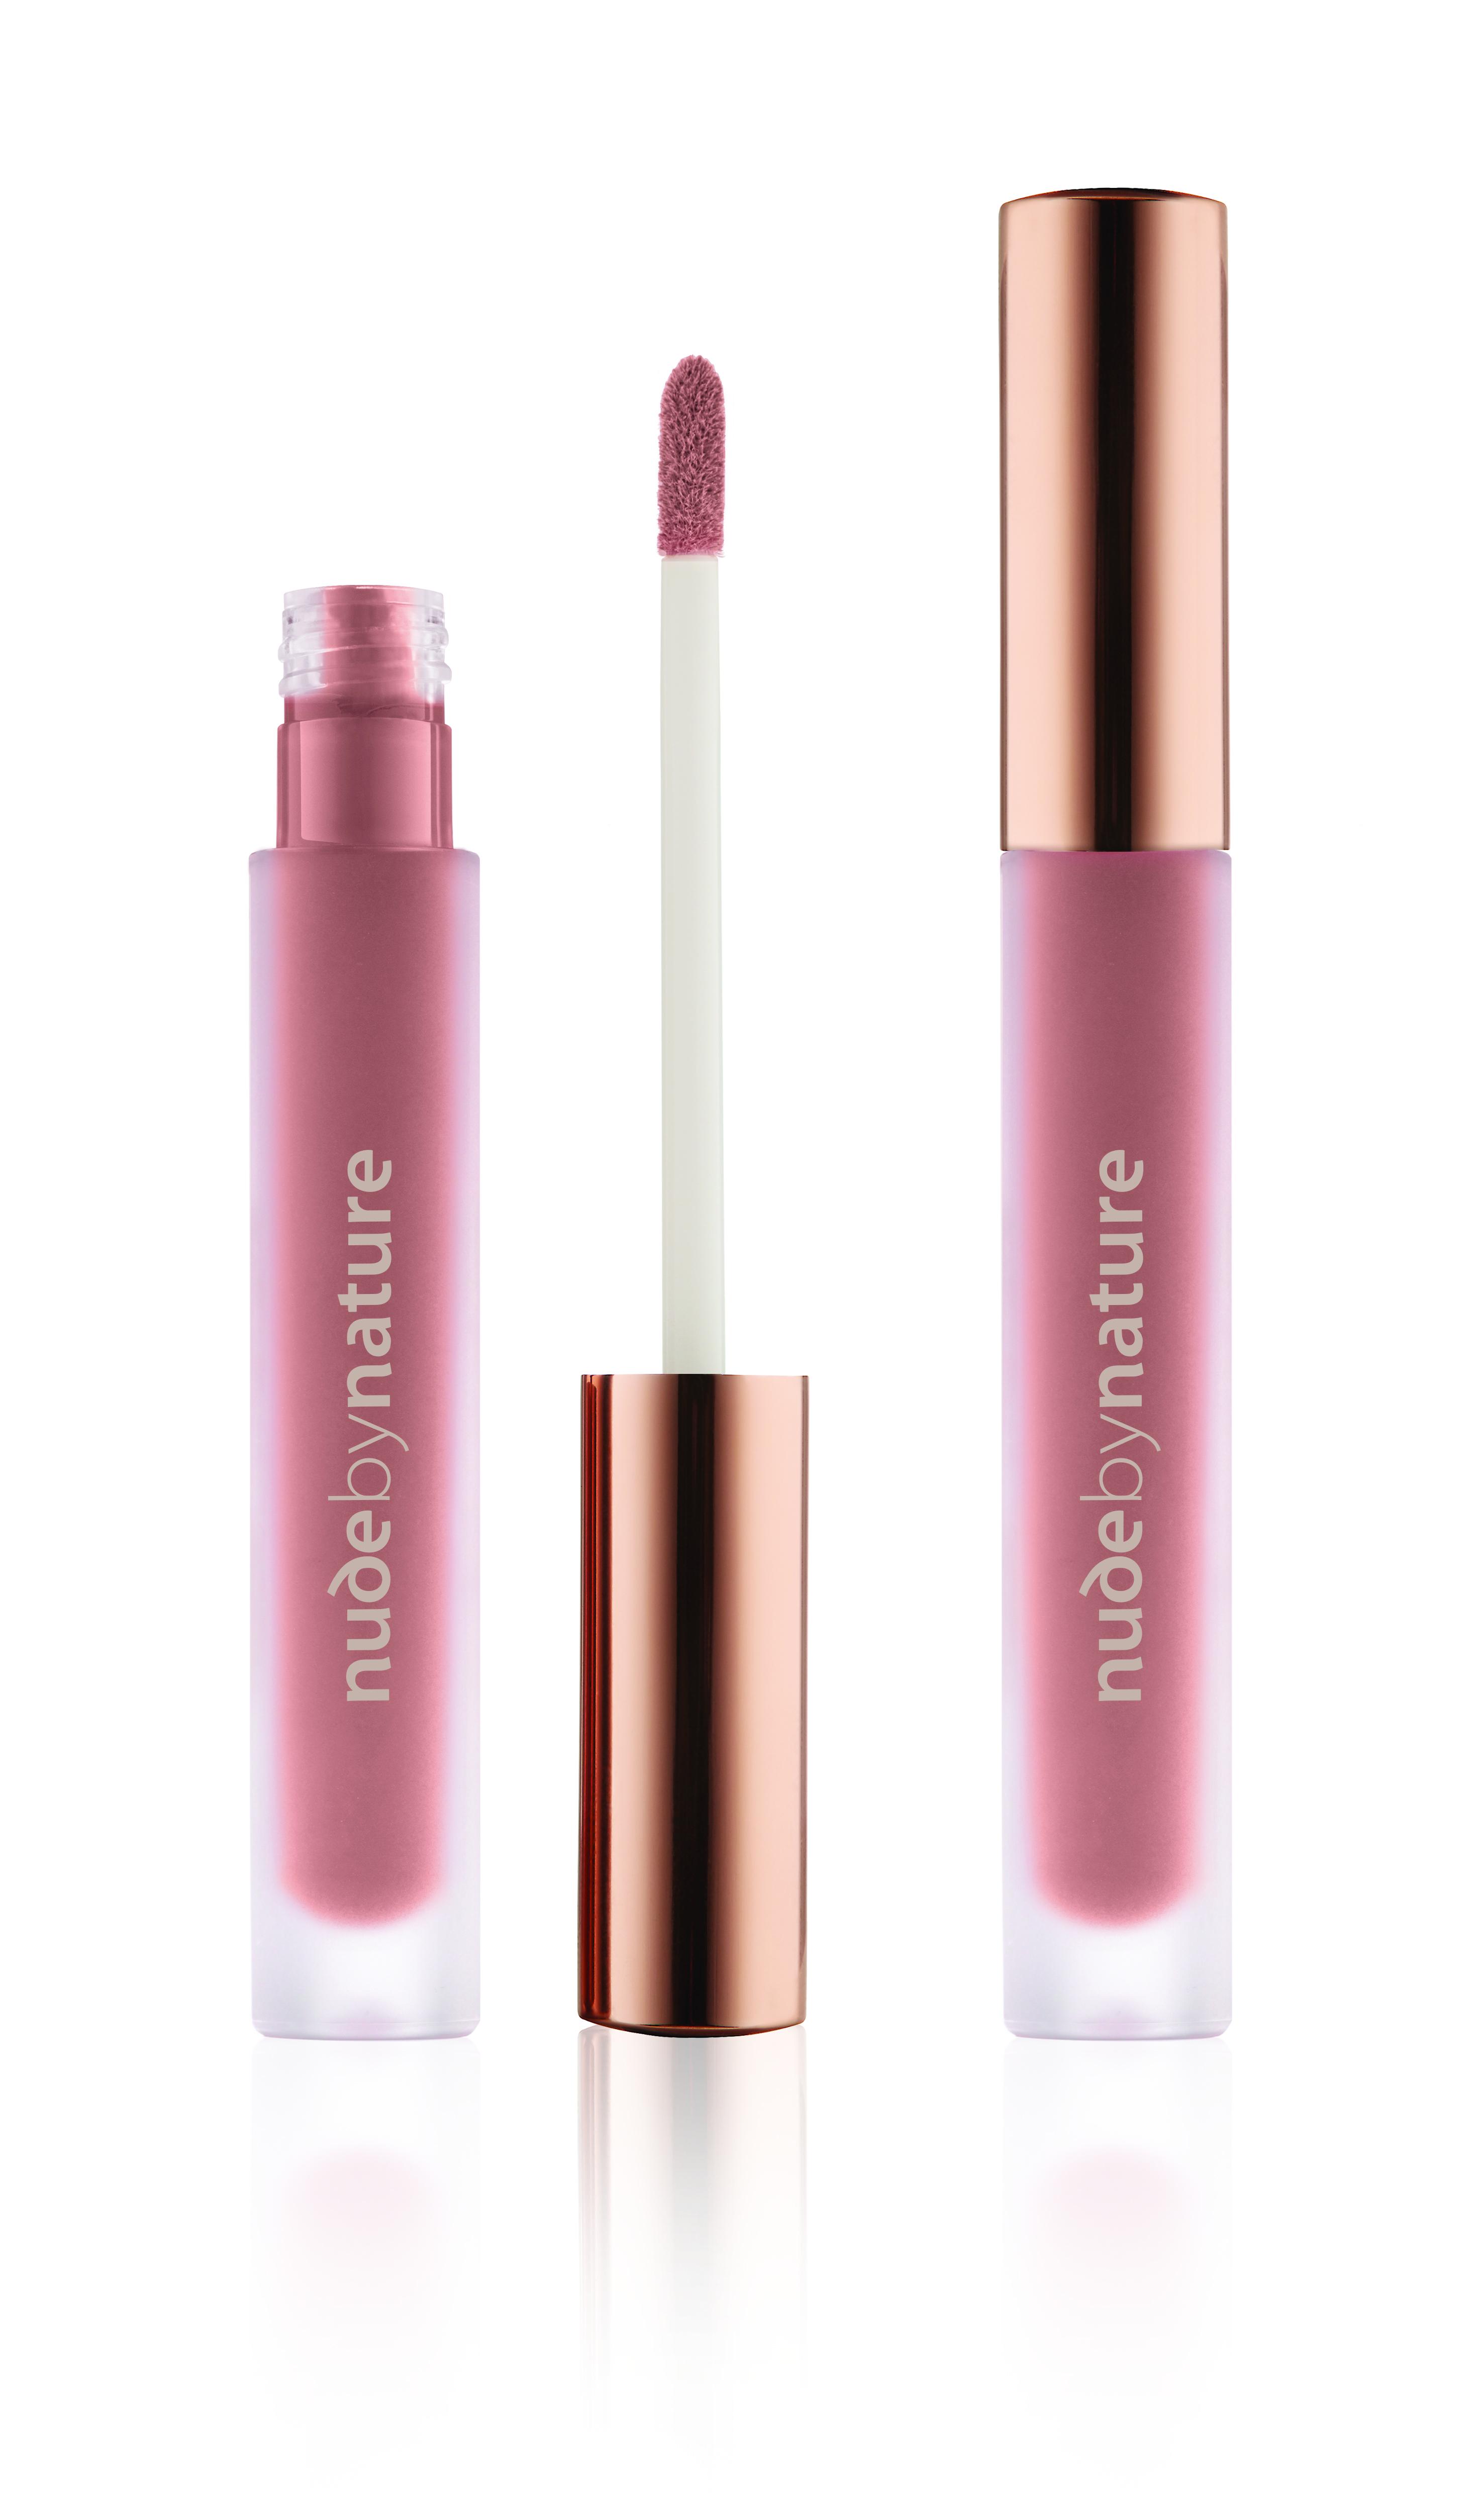 Nude by Nature - Satin Liquid Lipstick - 01 Sand